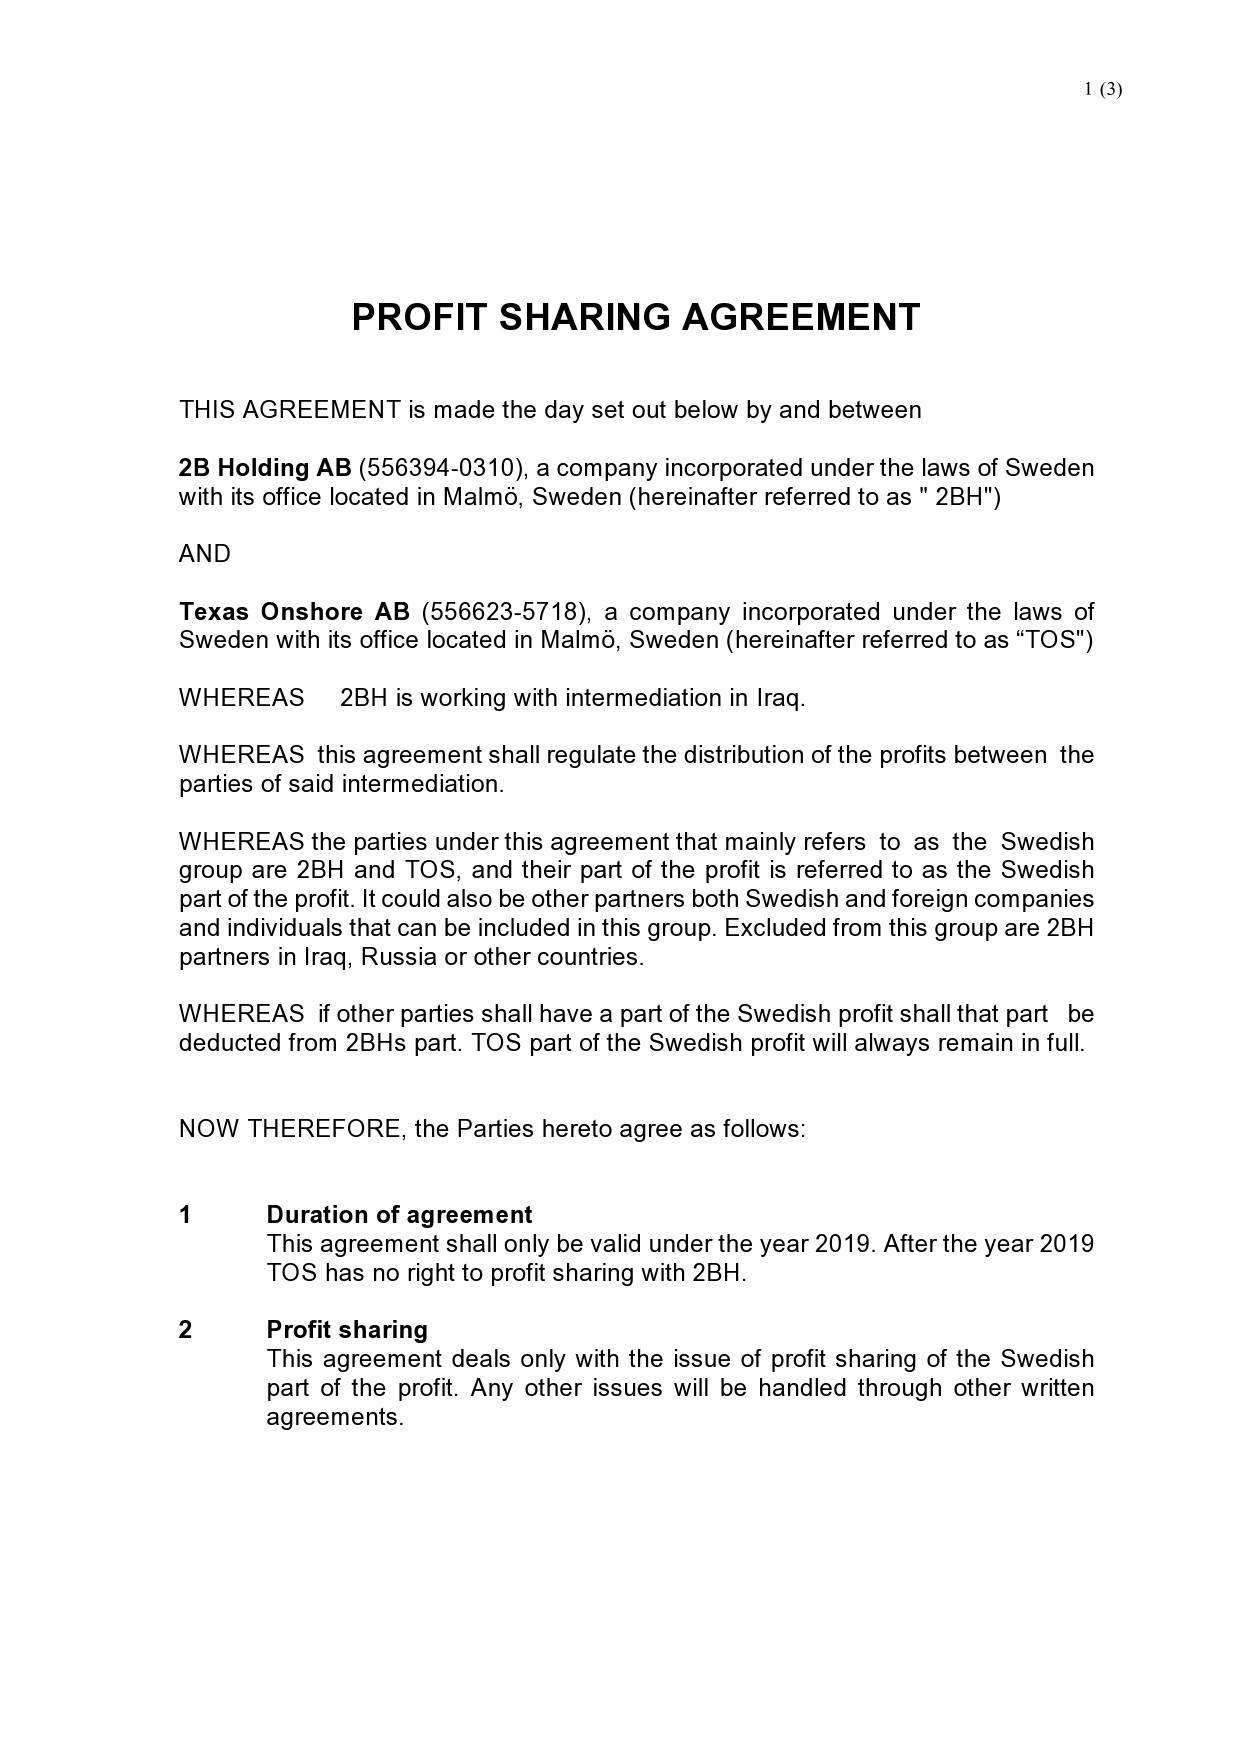 Free profit sharing agreement 33